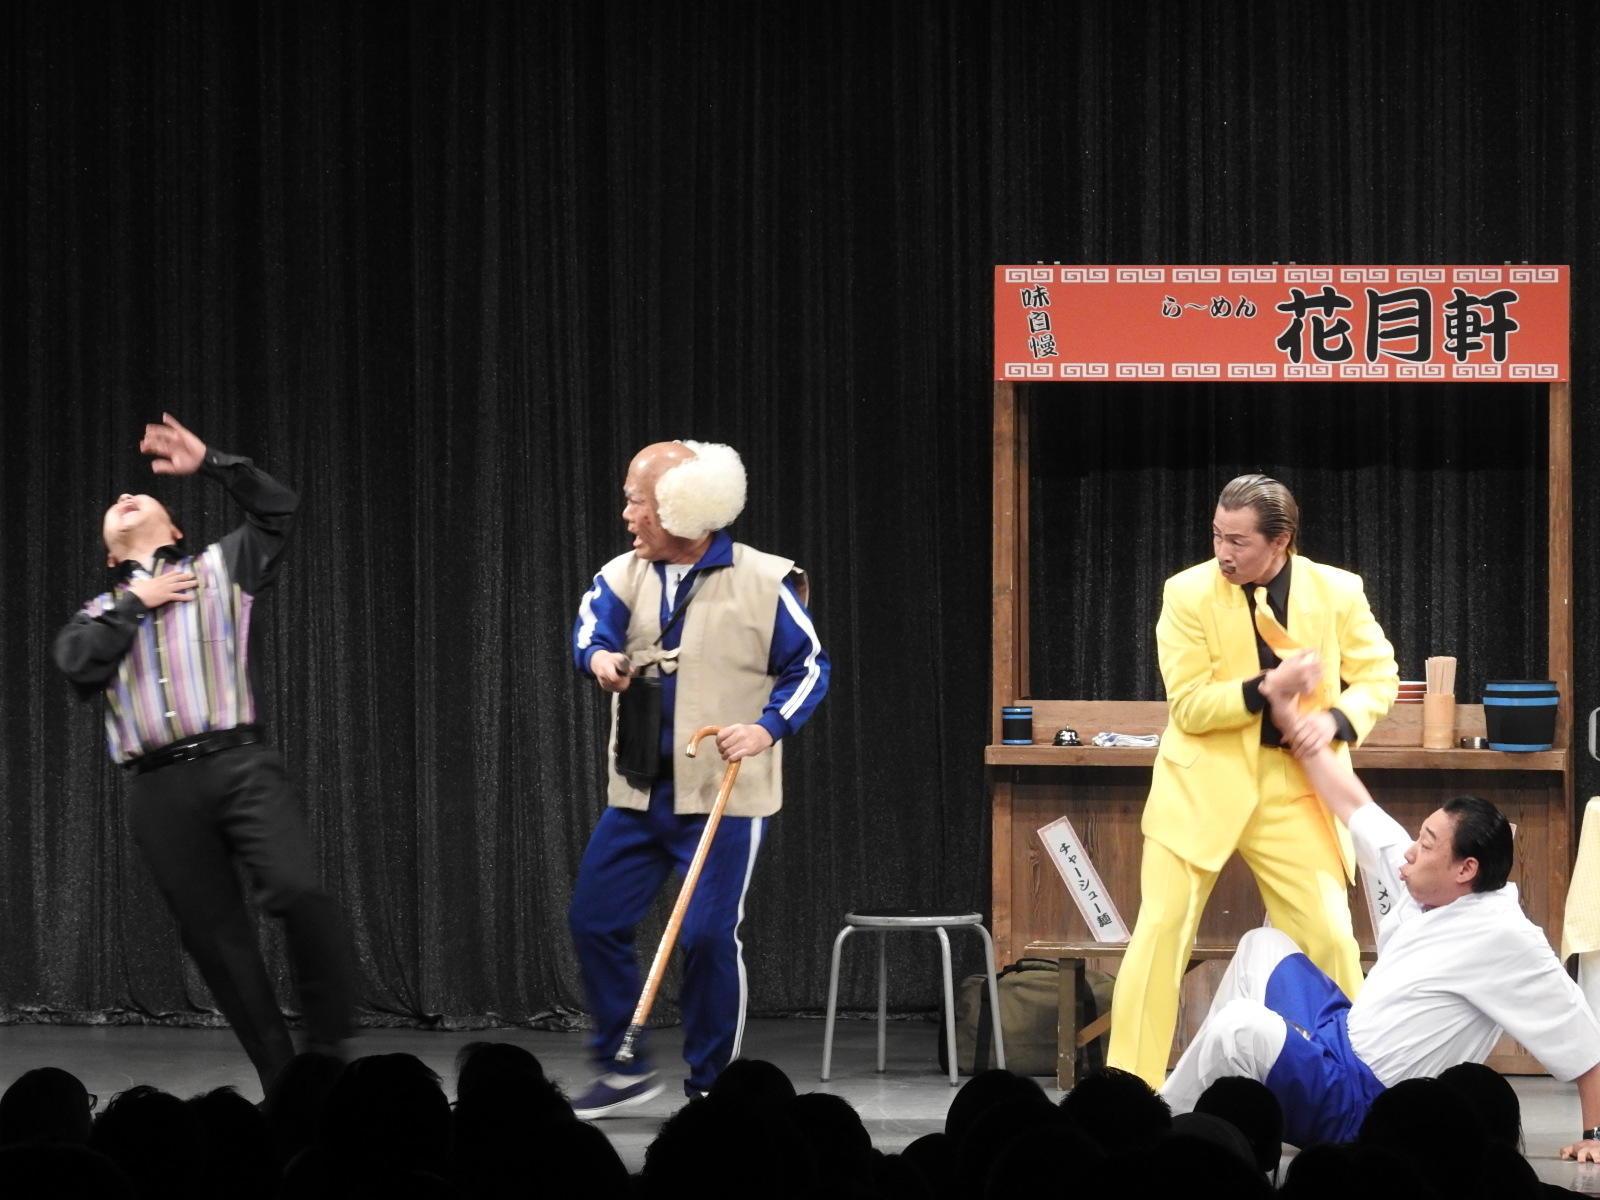 http://news.yoshimoto.co.jp/20171108143221-89c556168c70b982a94c736959a8f1244809993a.jpg